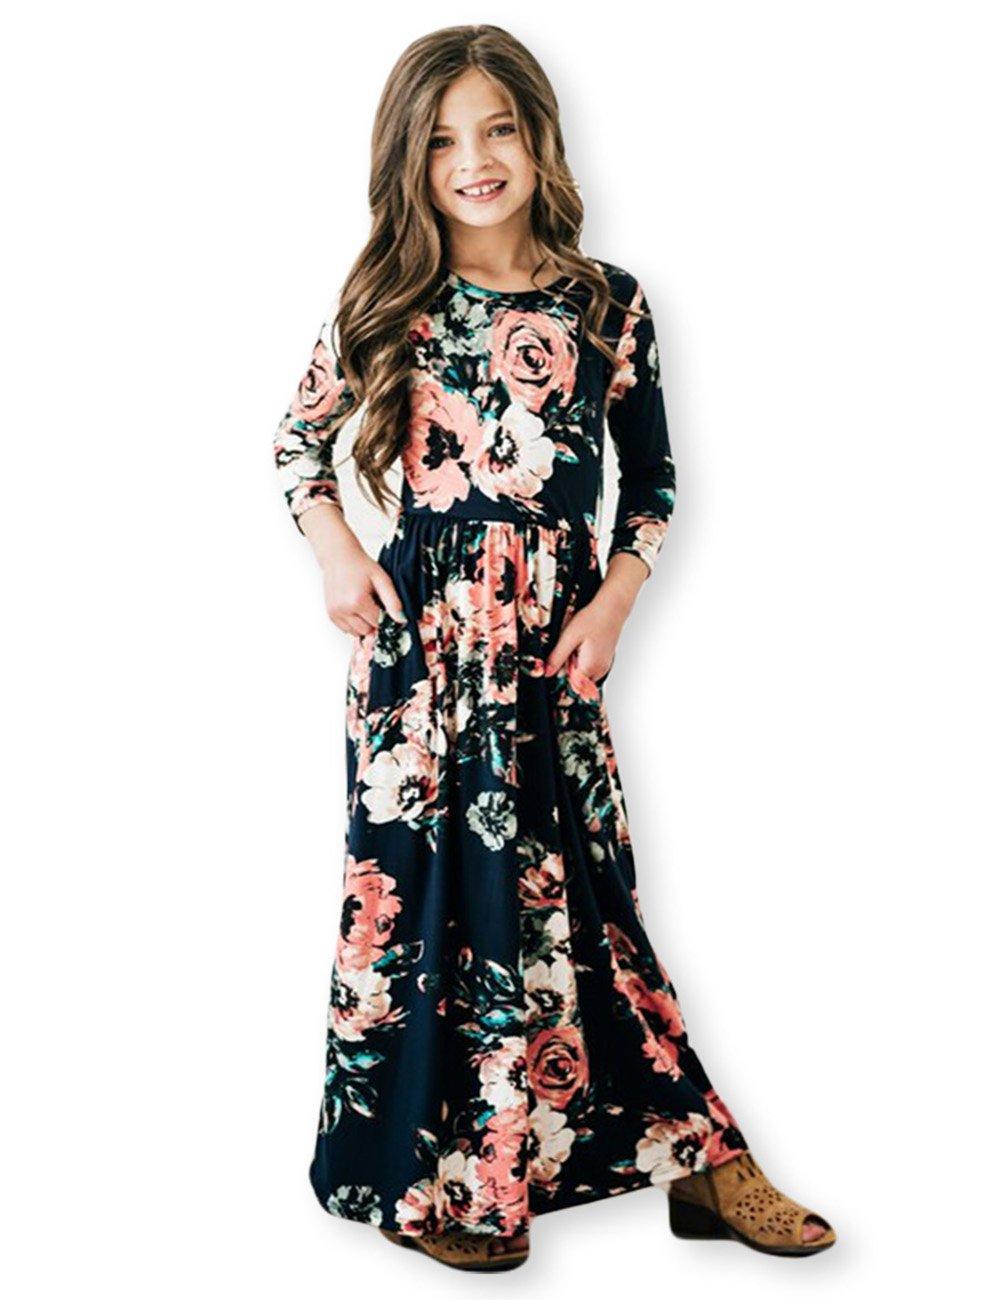 21KIDS Girls Floral Flared Pocket Maxi Three-Quarter Sleeves Holiday Long Dress, Black, 8 Years